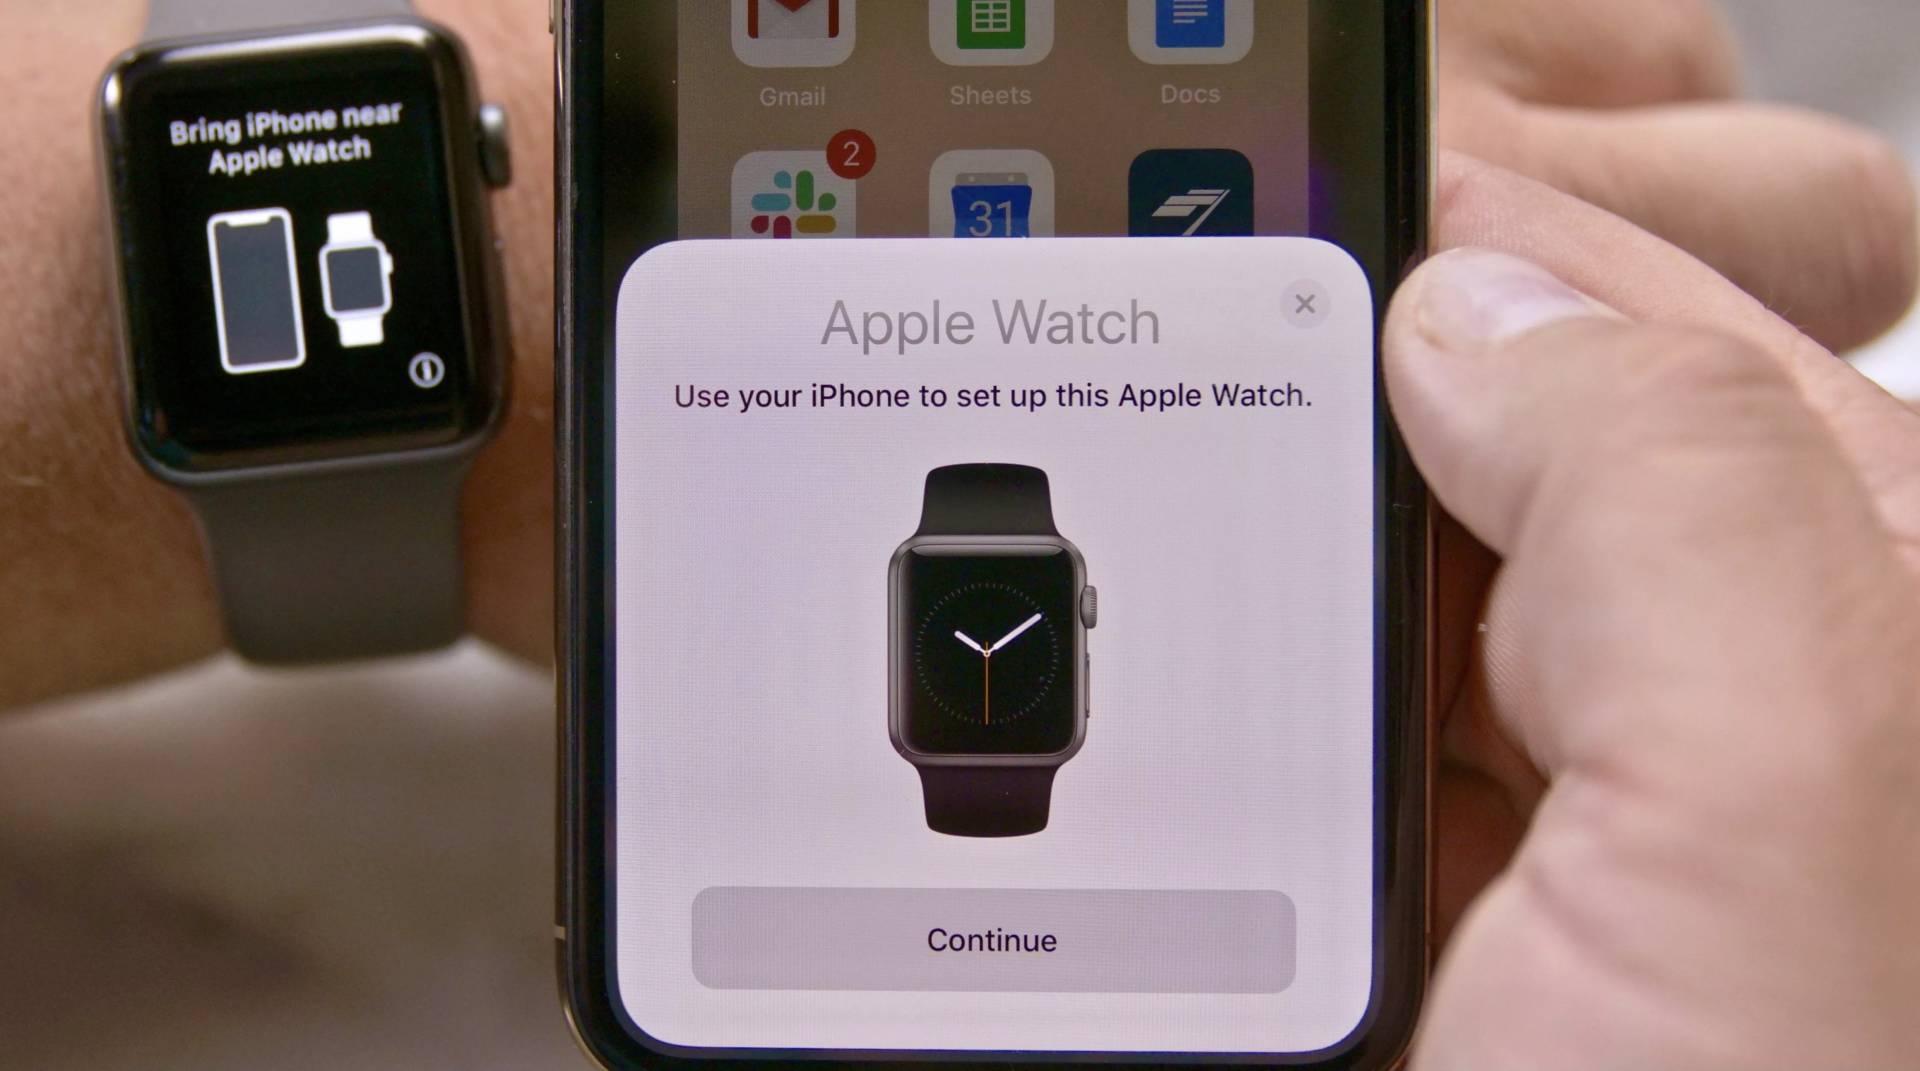 iPhone Apple Watch